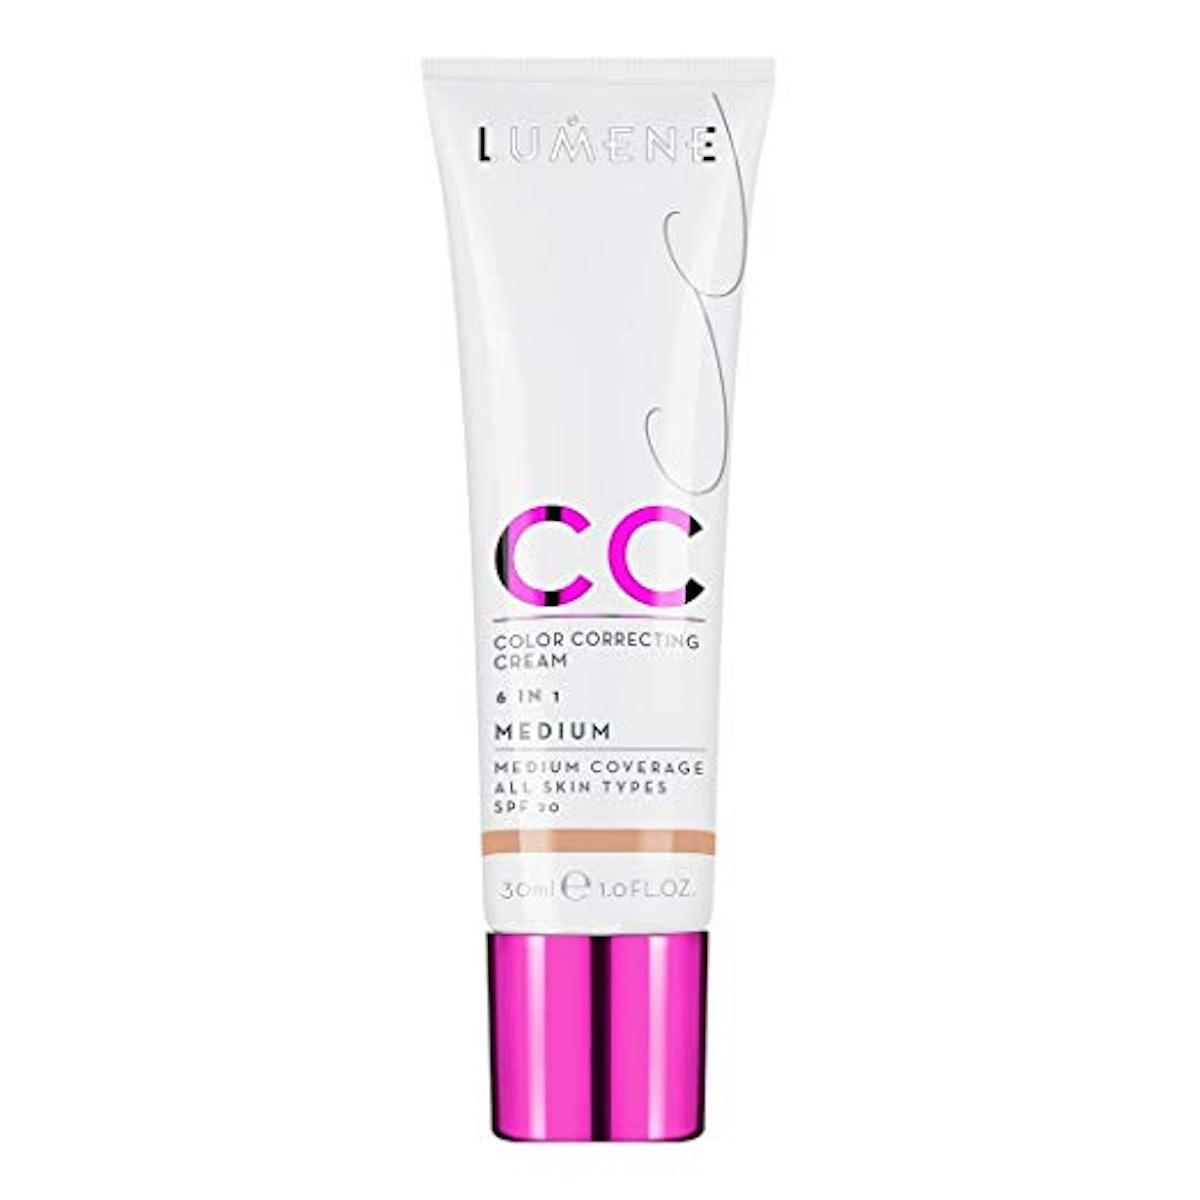 Lumene CC Color Correcting Cream SPF 20